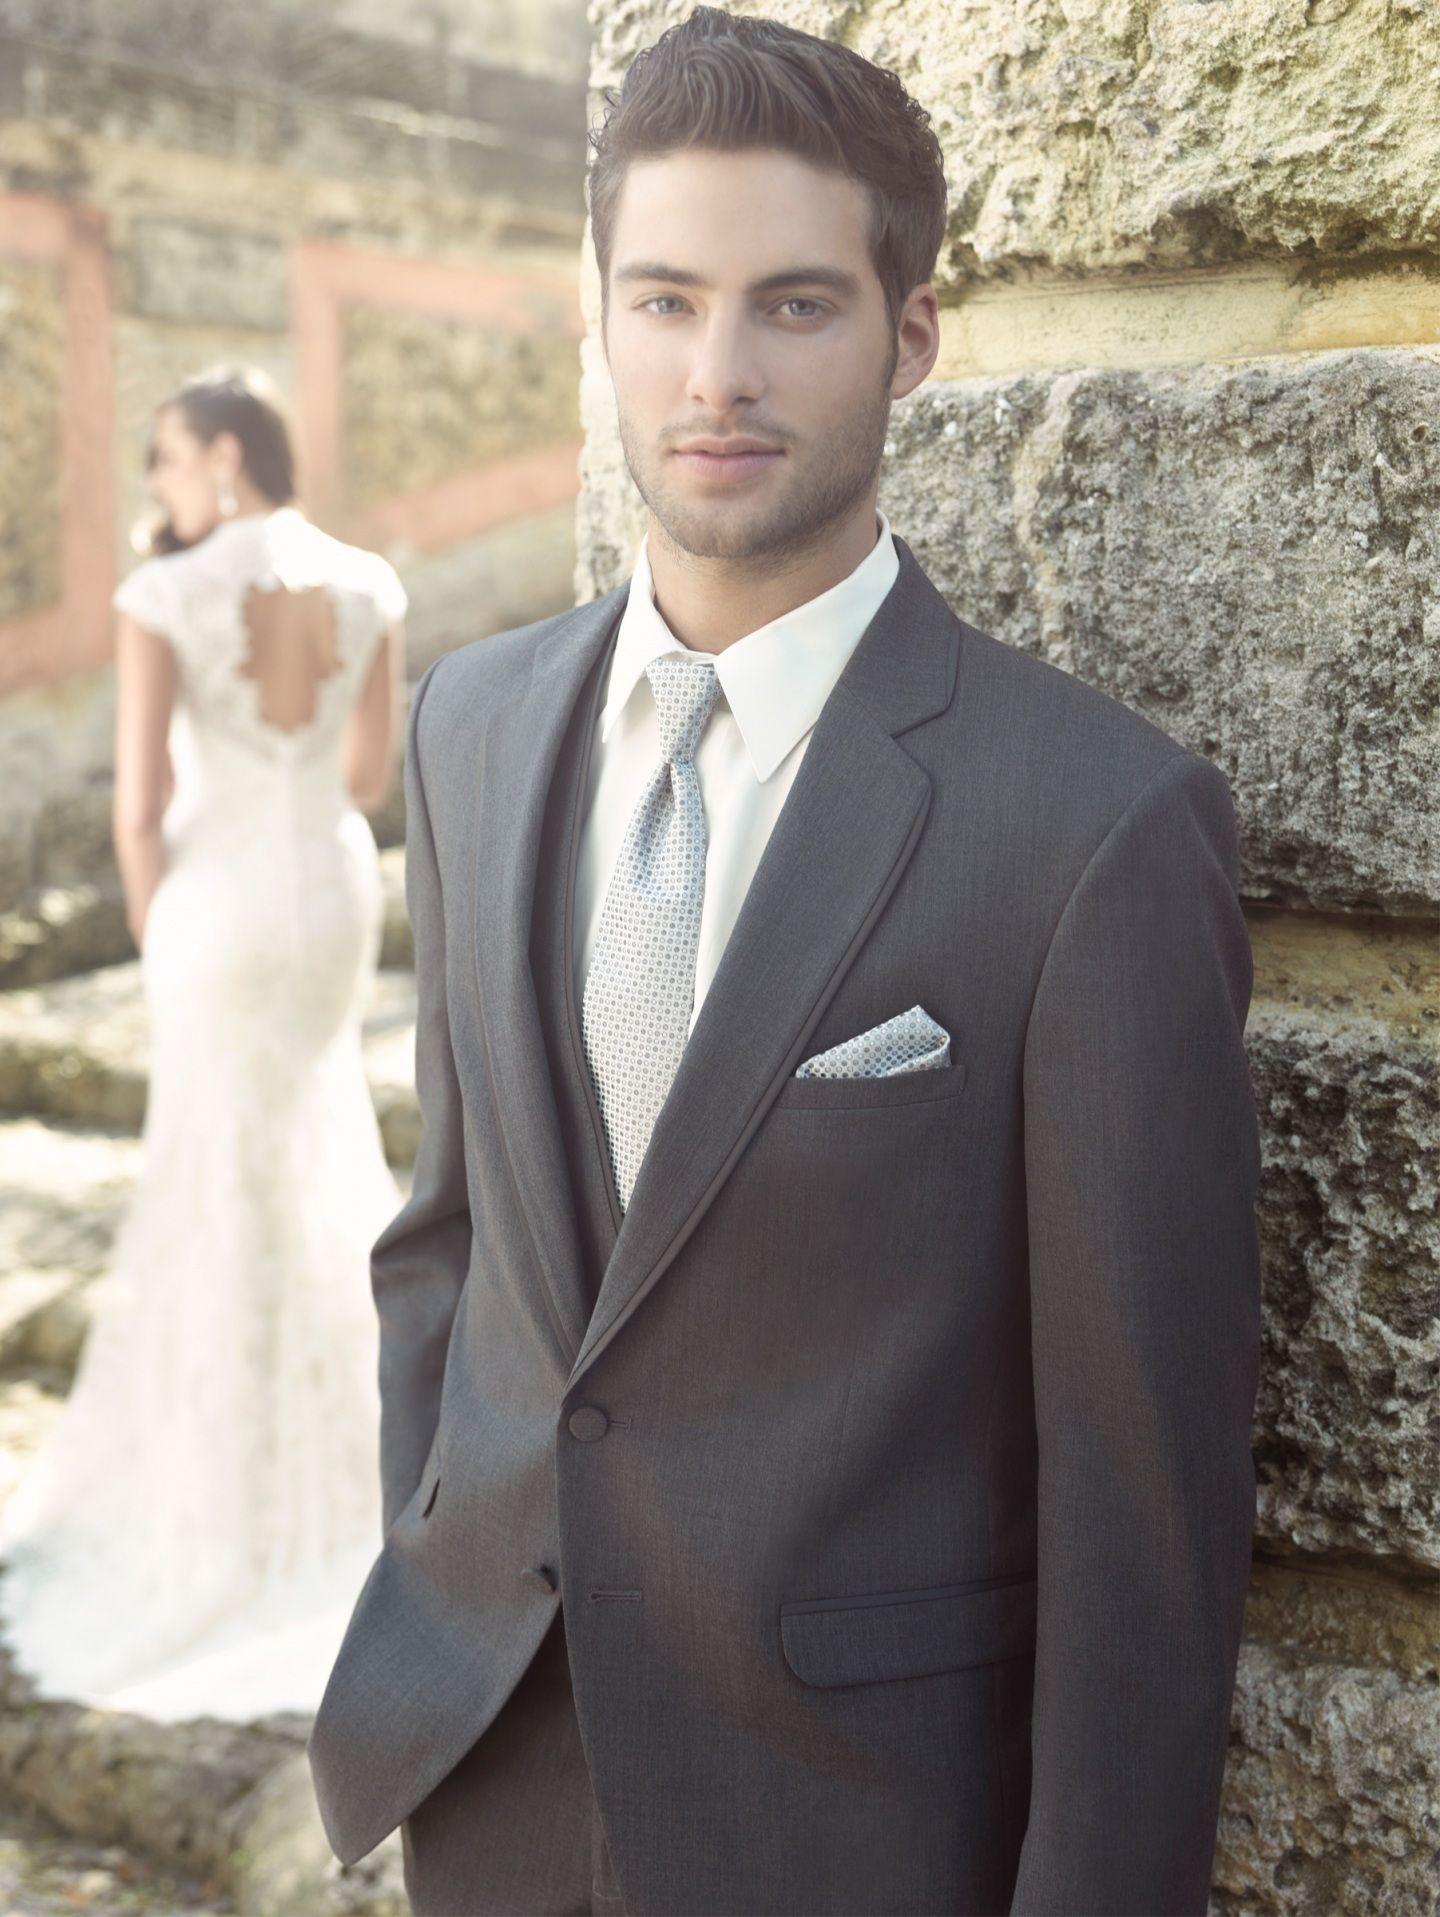 Wedding Dress Luxurious Wedding Suits San Francisco Stunning Wedding ...